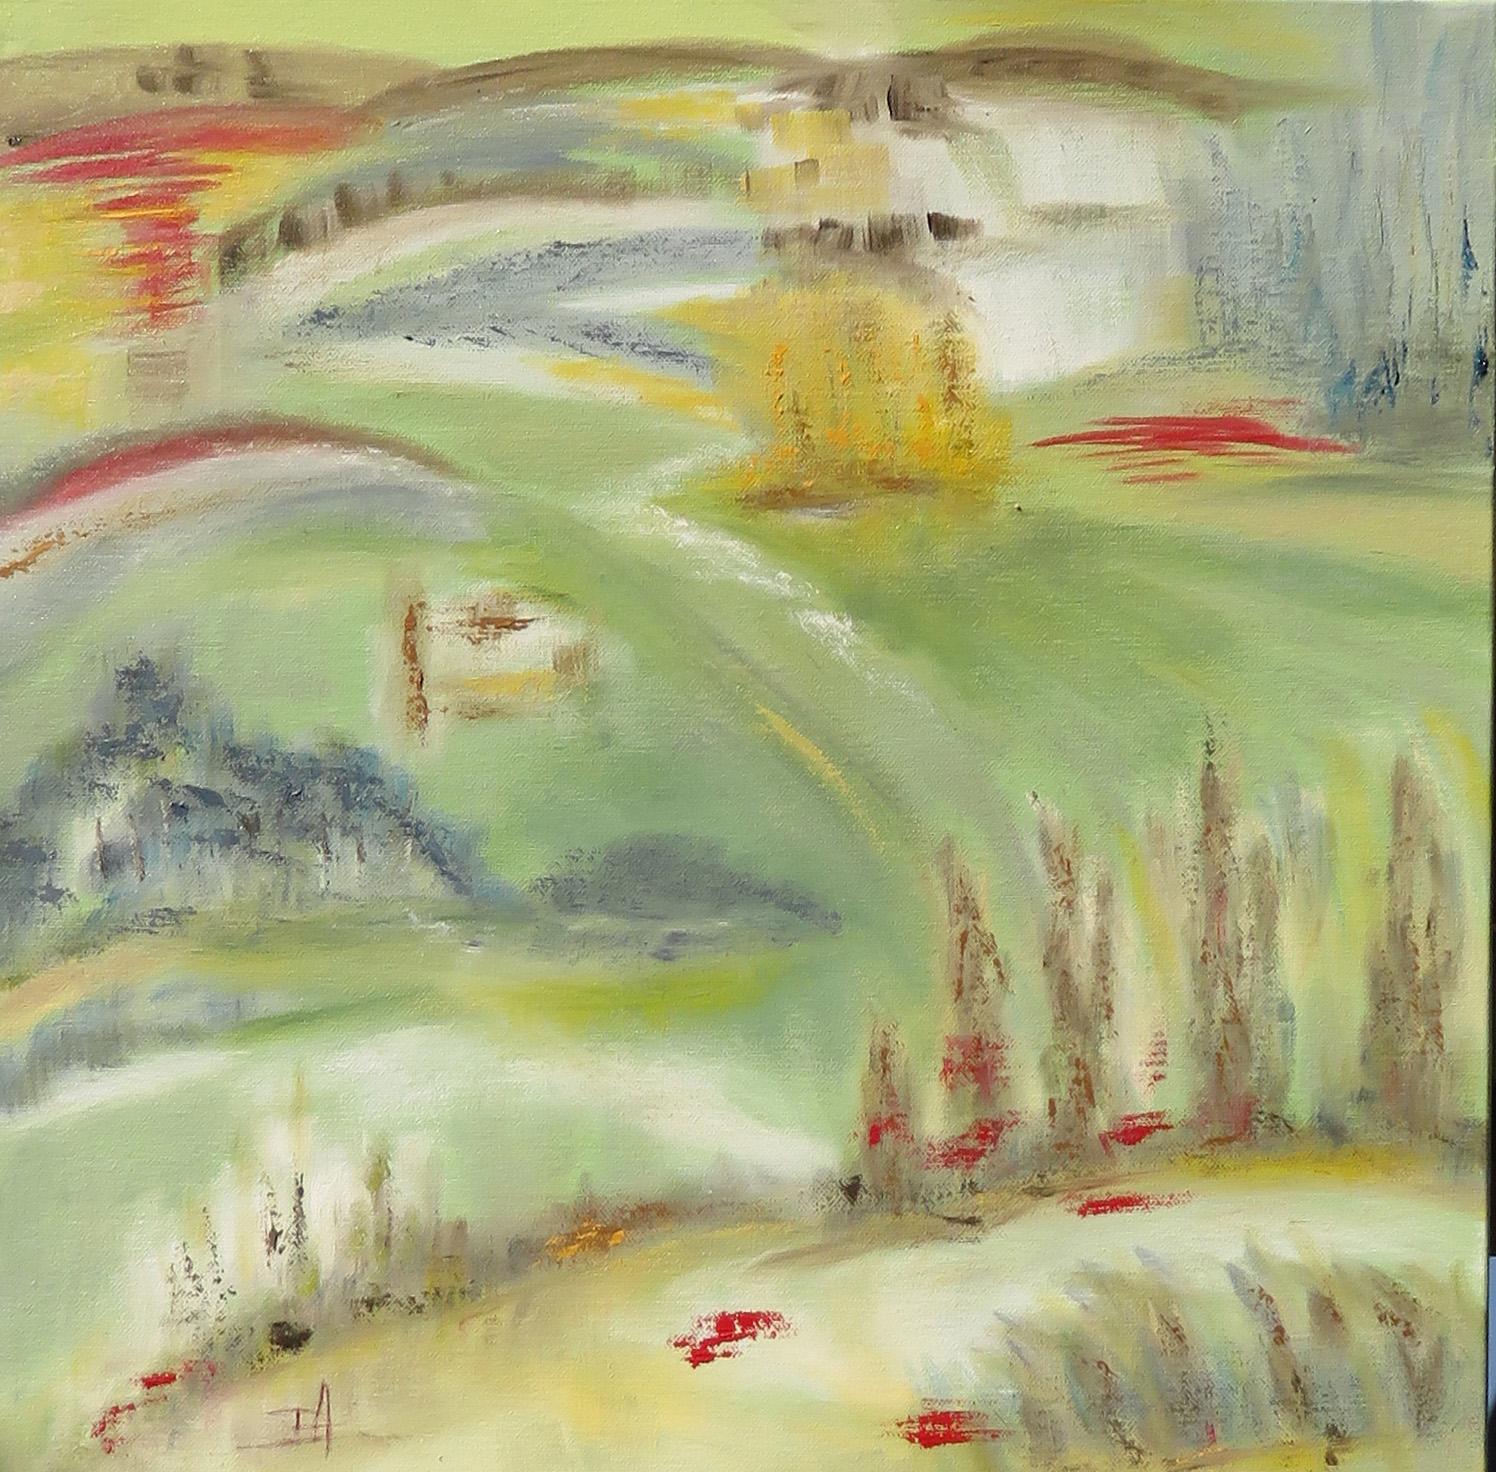 Paysage abstrait Sept 2021